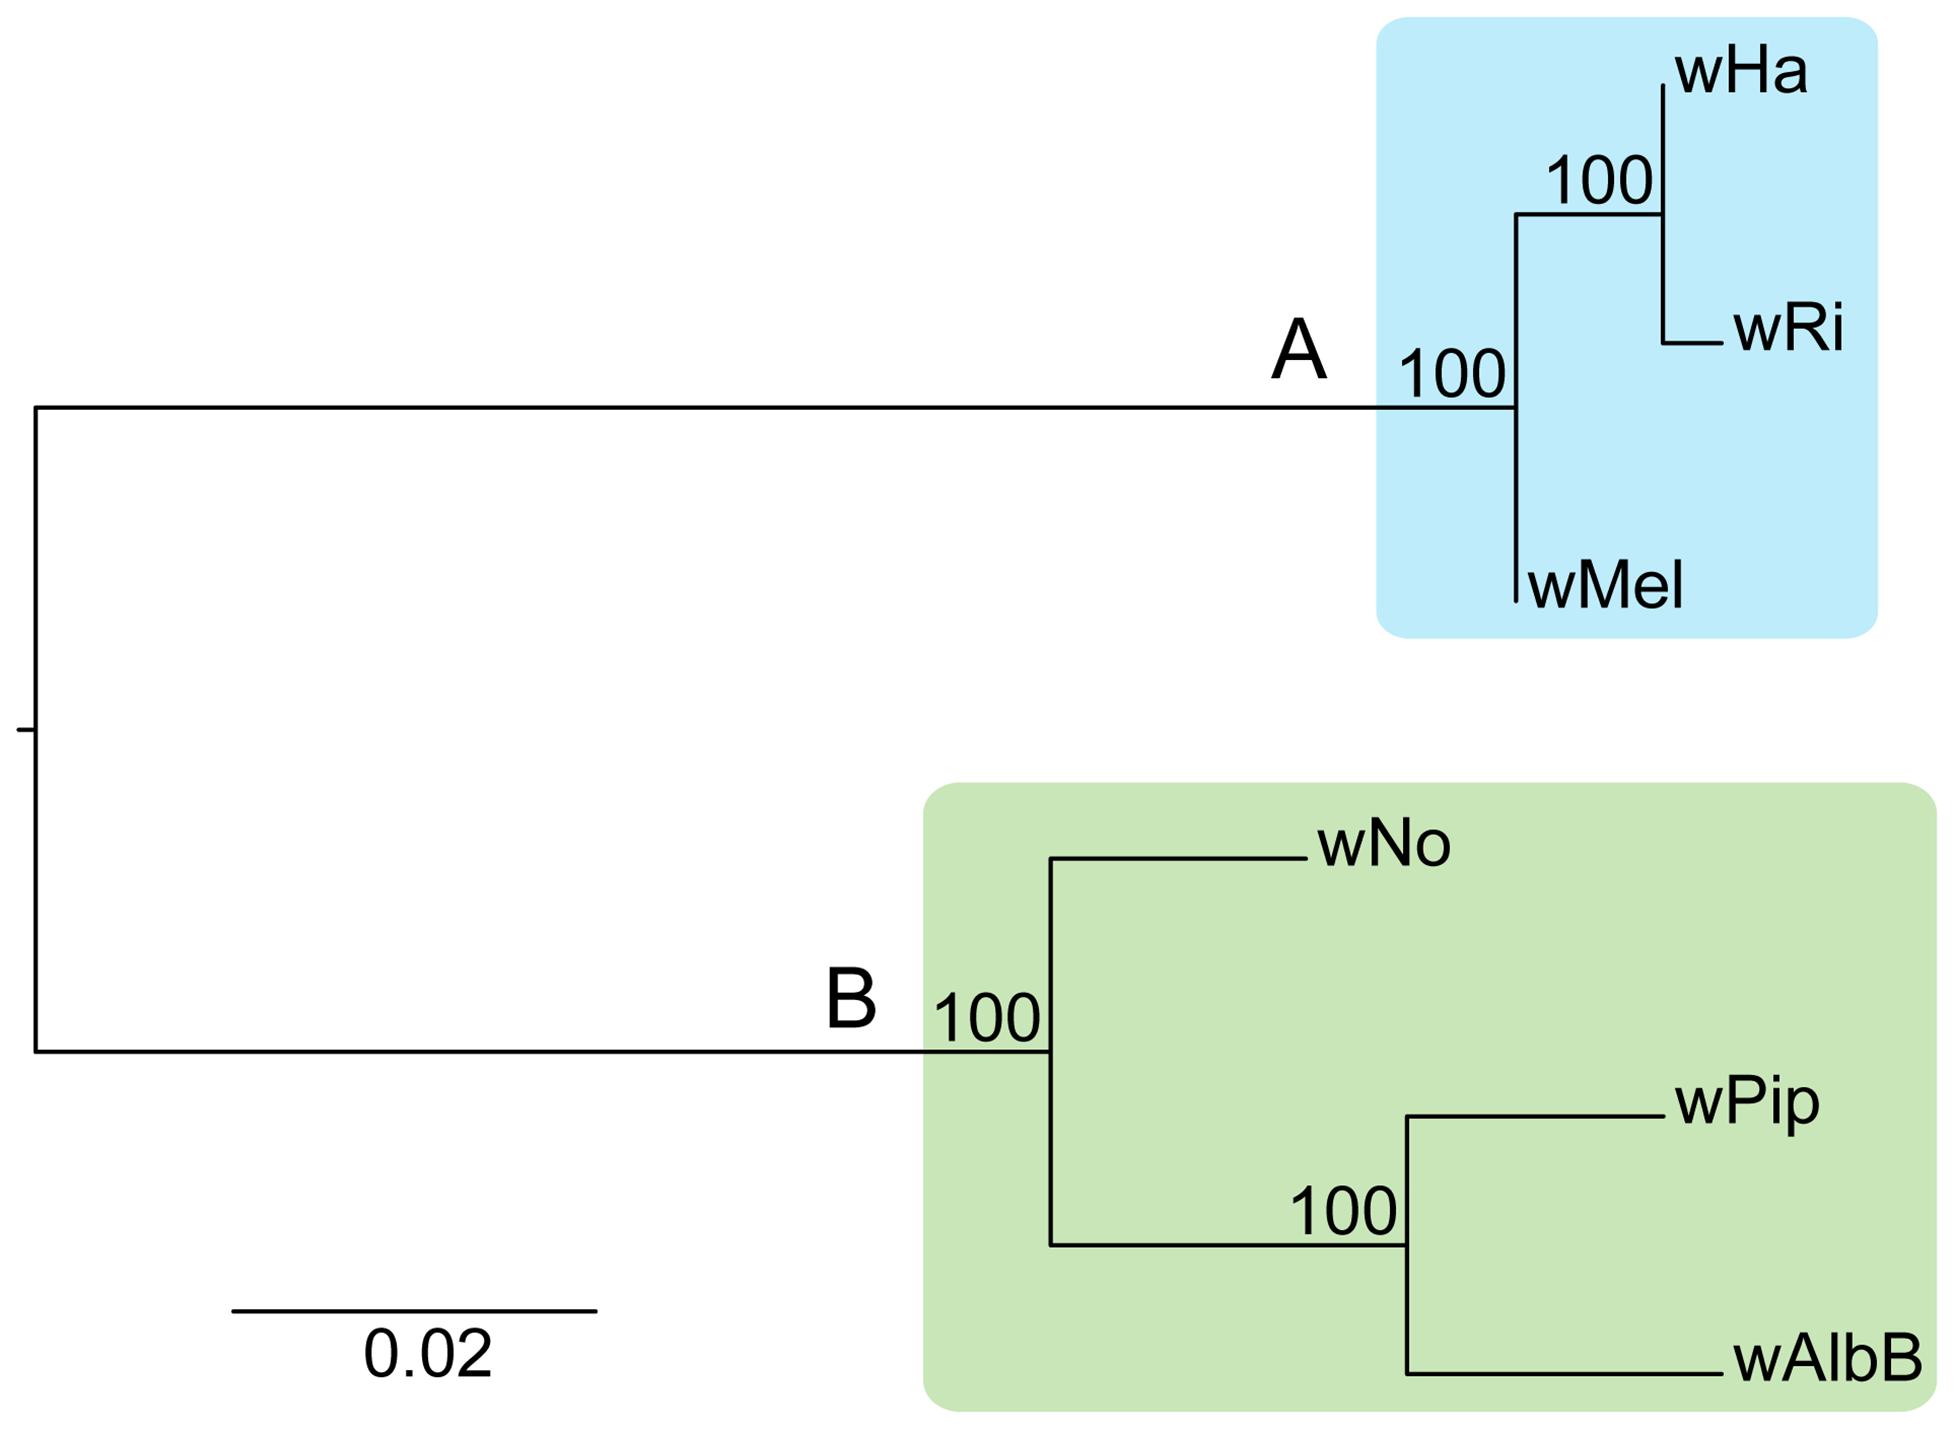 Phylogenetic relationships of six <i>Wolbachia</i> strains.